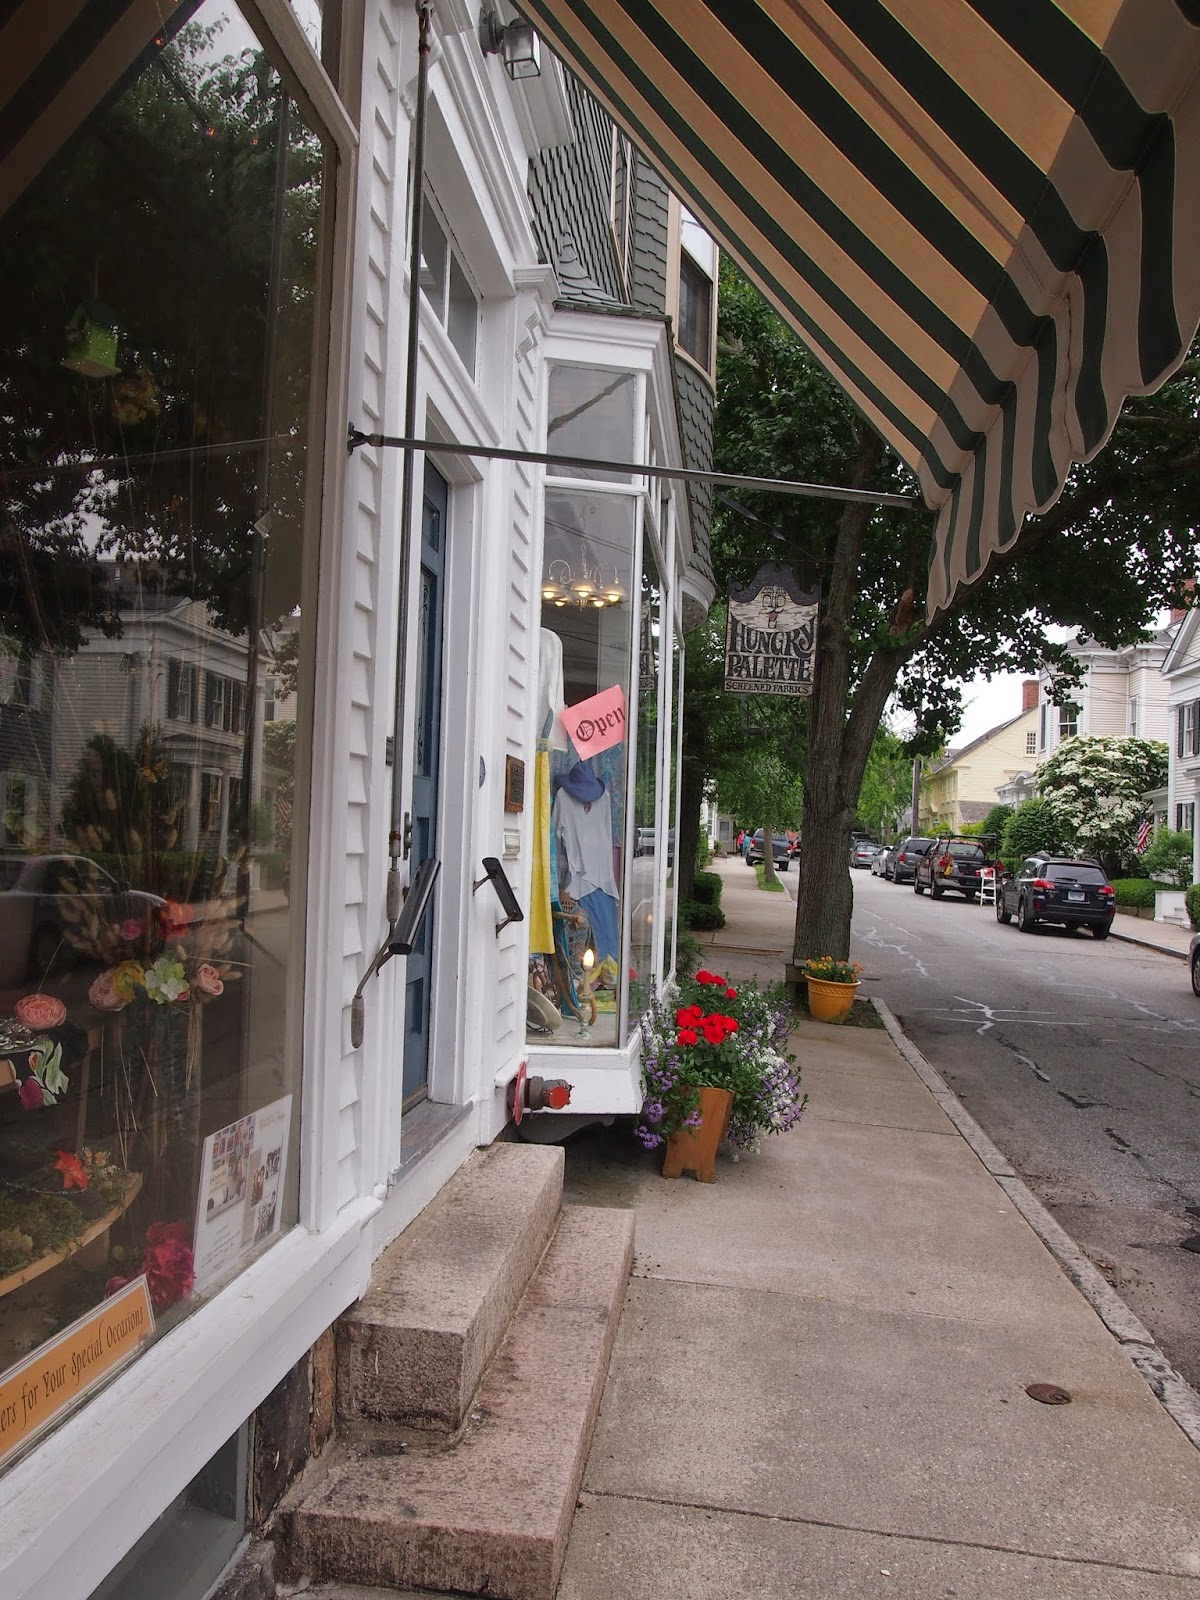 The quaint streets of Stonington